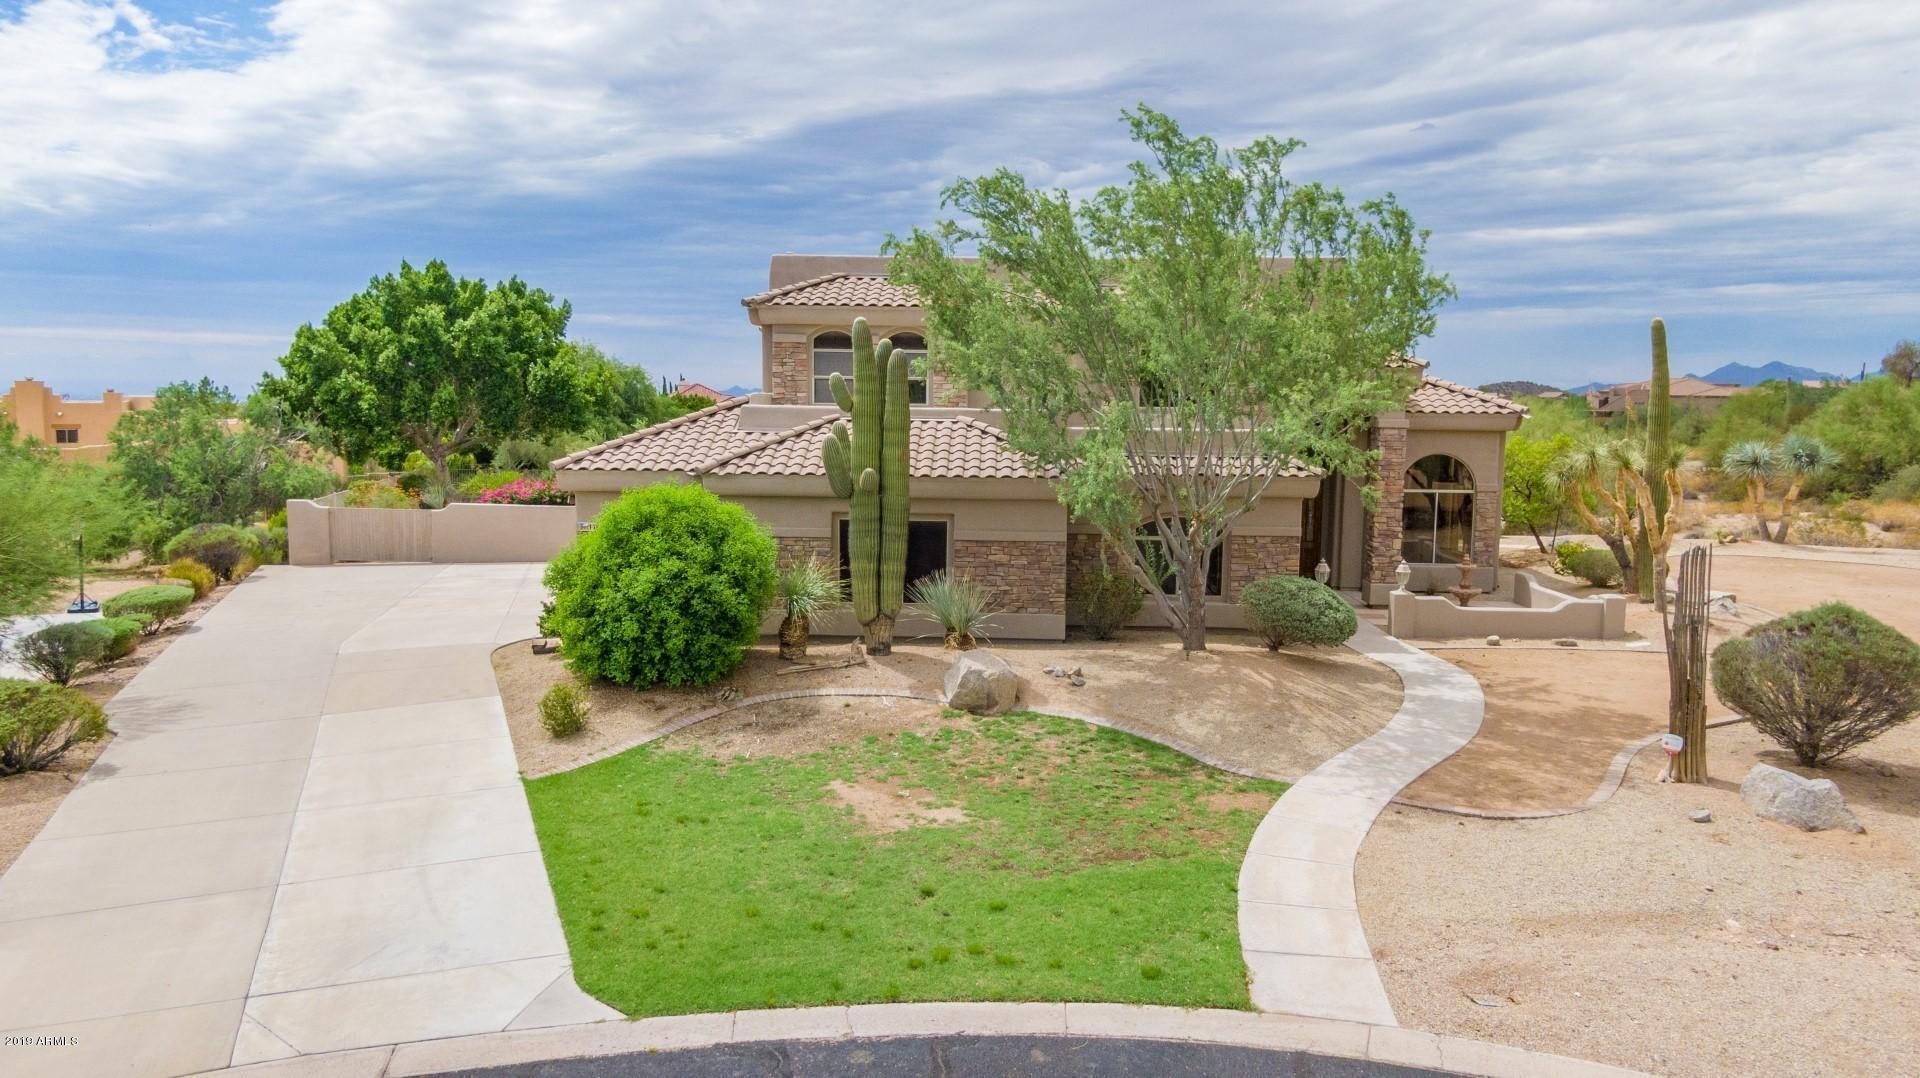 Photo of 3530 N HAWES Road #11, Mesa, AZ 85207